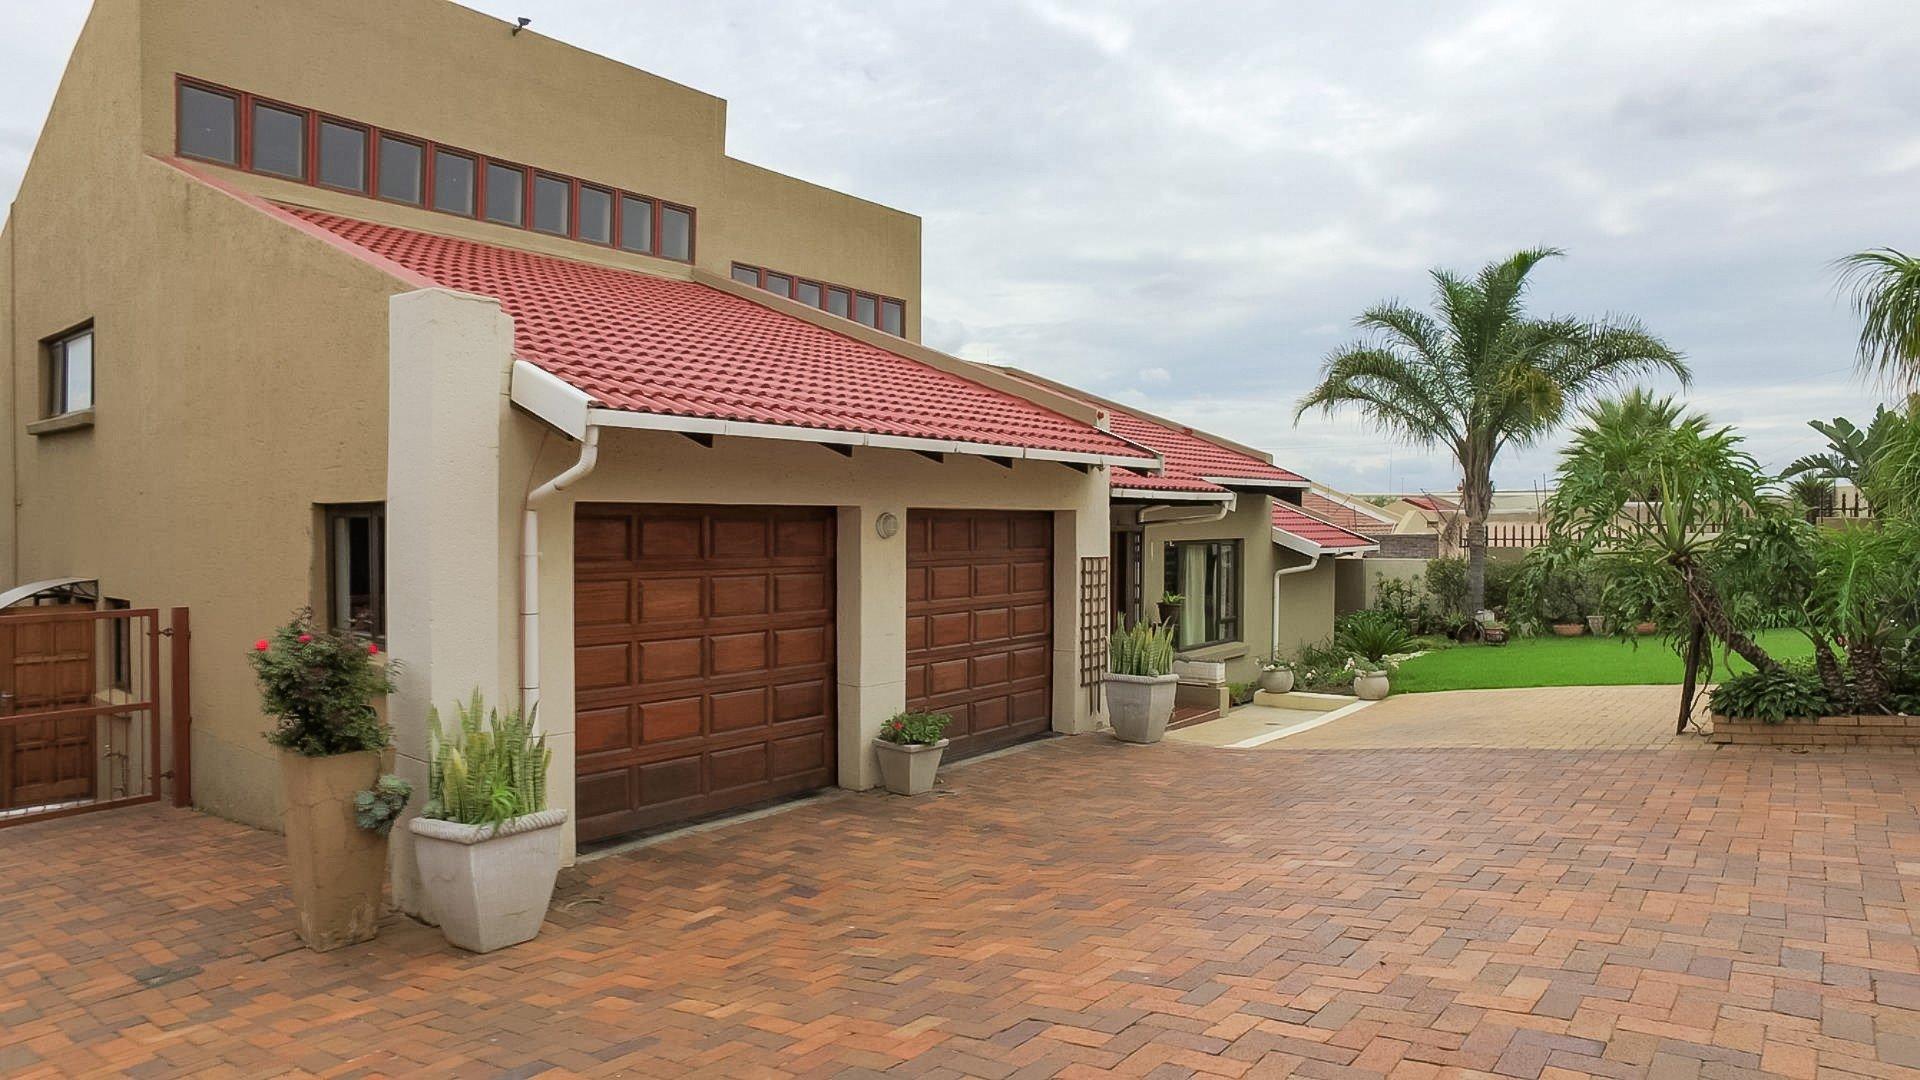 Germiston, Elandshaven Property  | Houses For Sale Elandshaven, Elandshaven, House 3 bedrooms property for sale Price:1,950,000